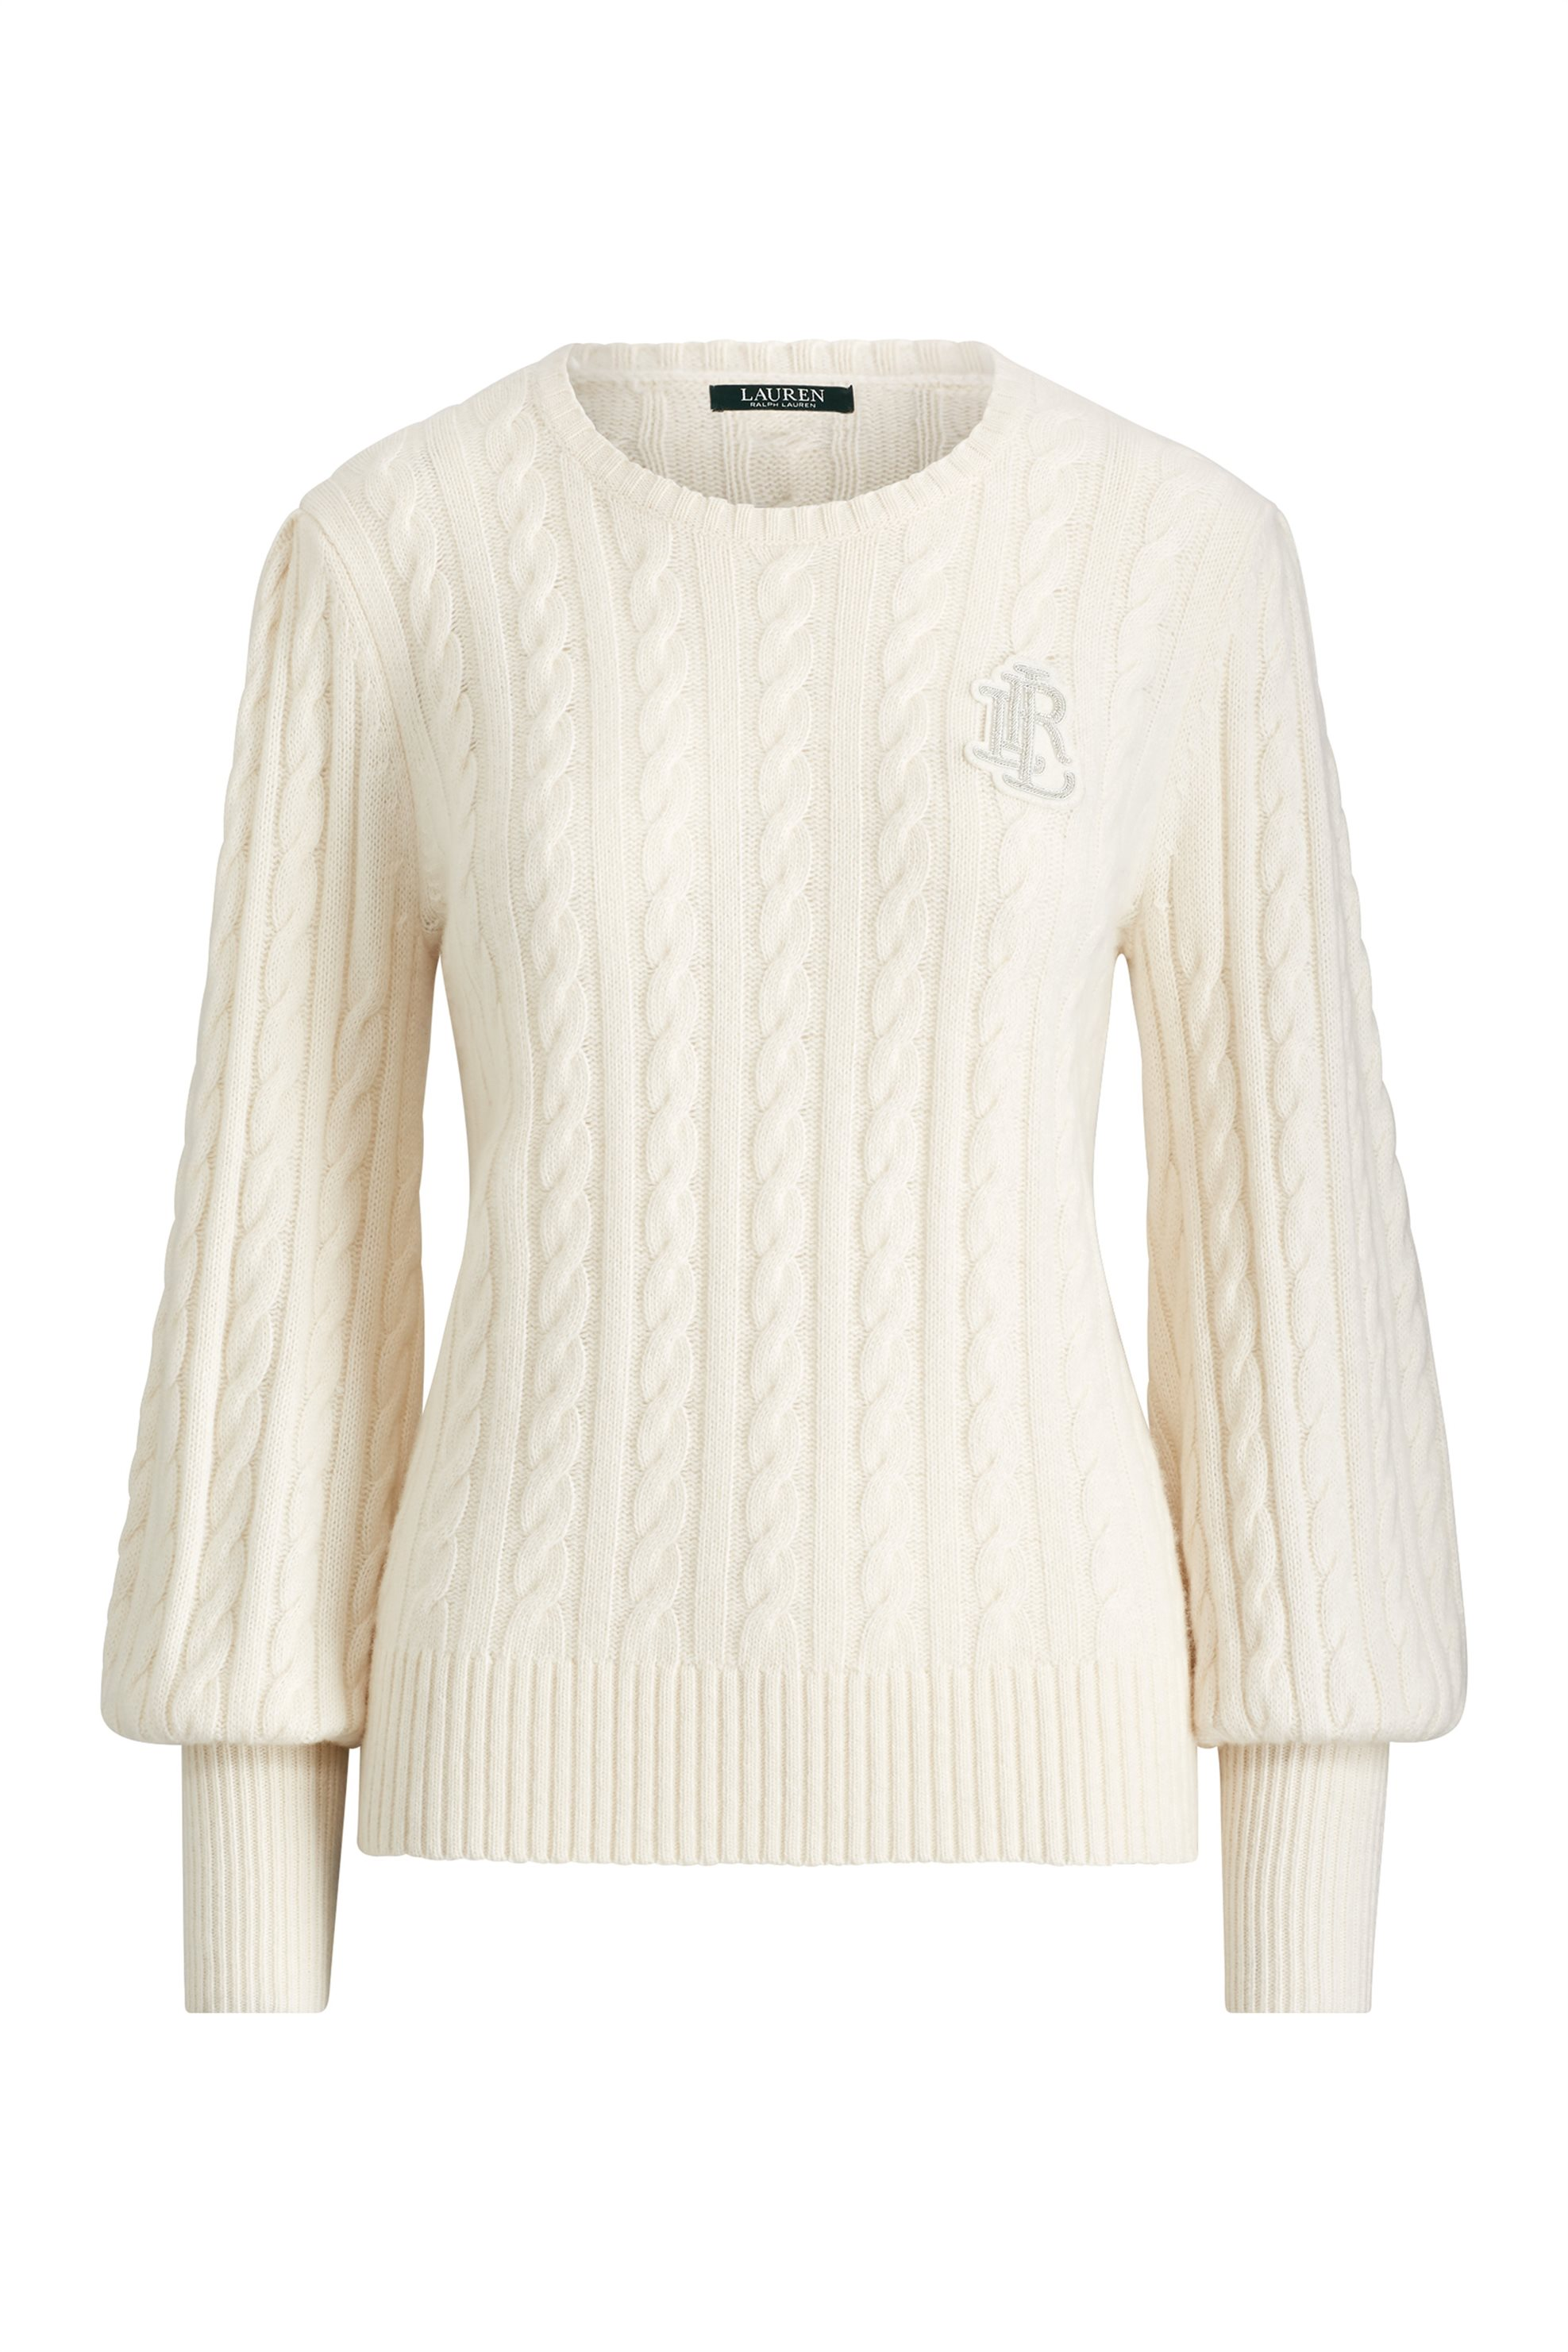 Lauren Ralph Lauren γυναικεία πλεκτή μπλούζα με πλεξούδα και φουσκωτά μανίκια -  γυναικα   ρουχα   πλεκτά   πουλόβερ